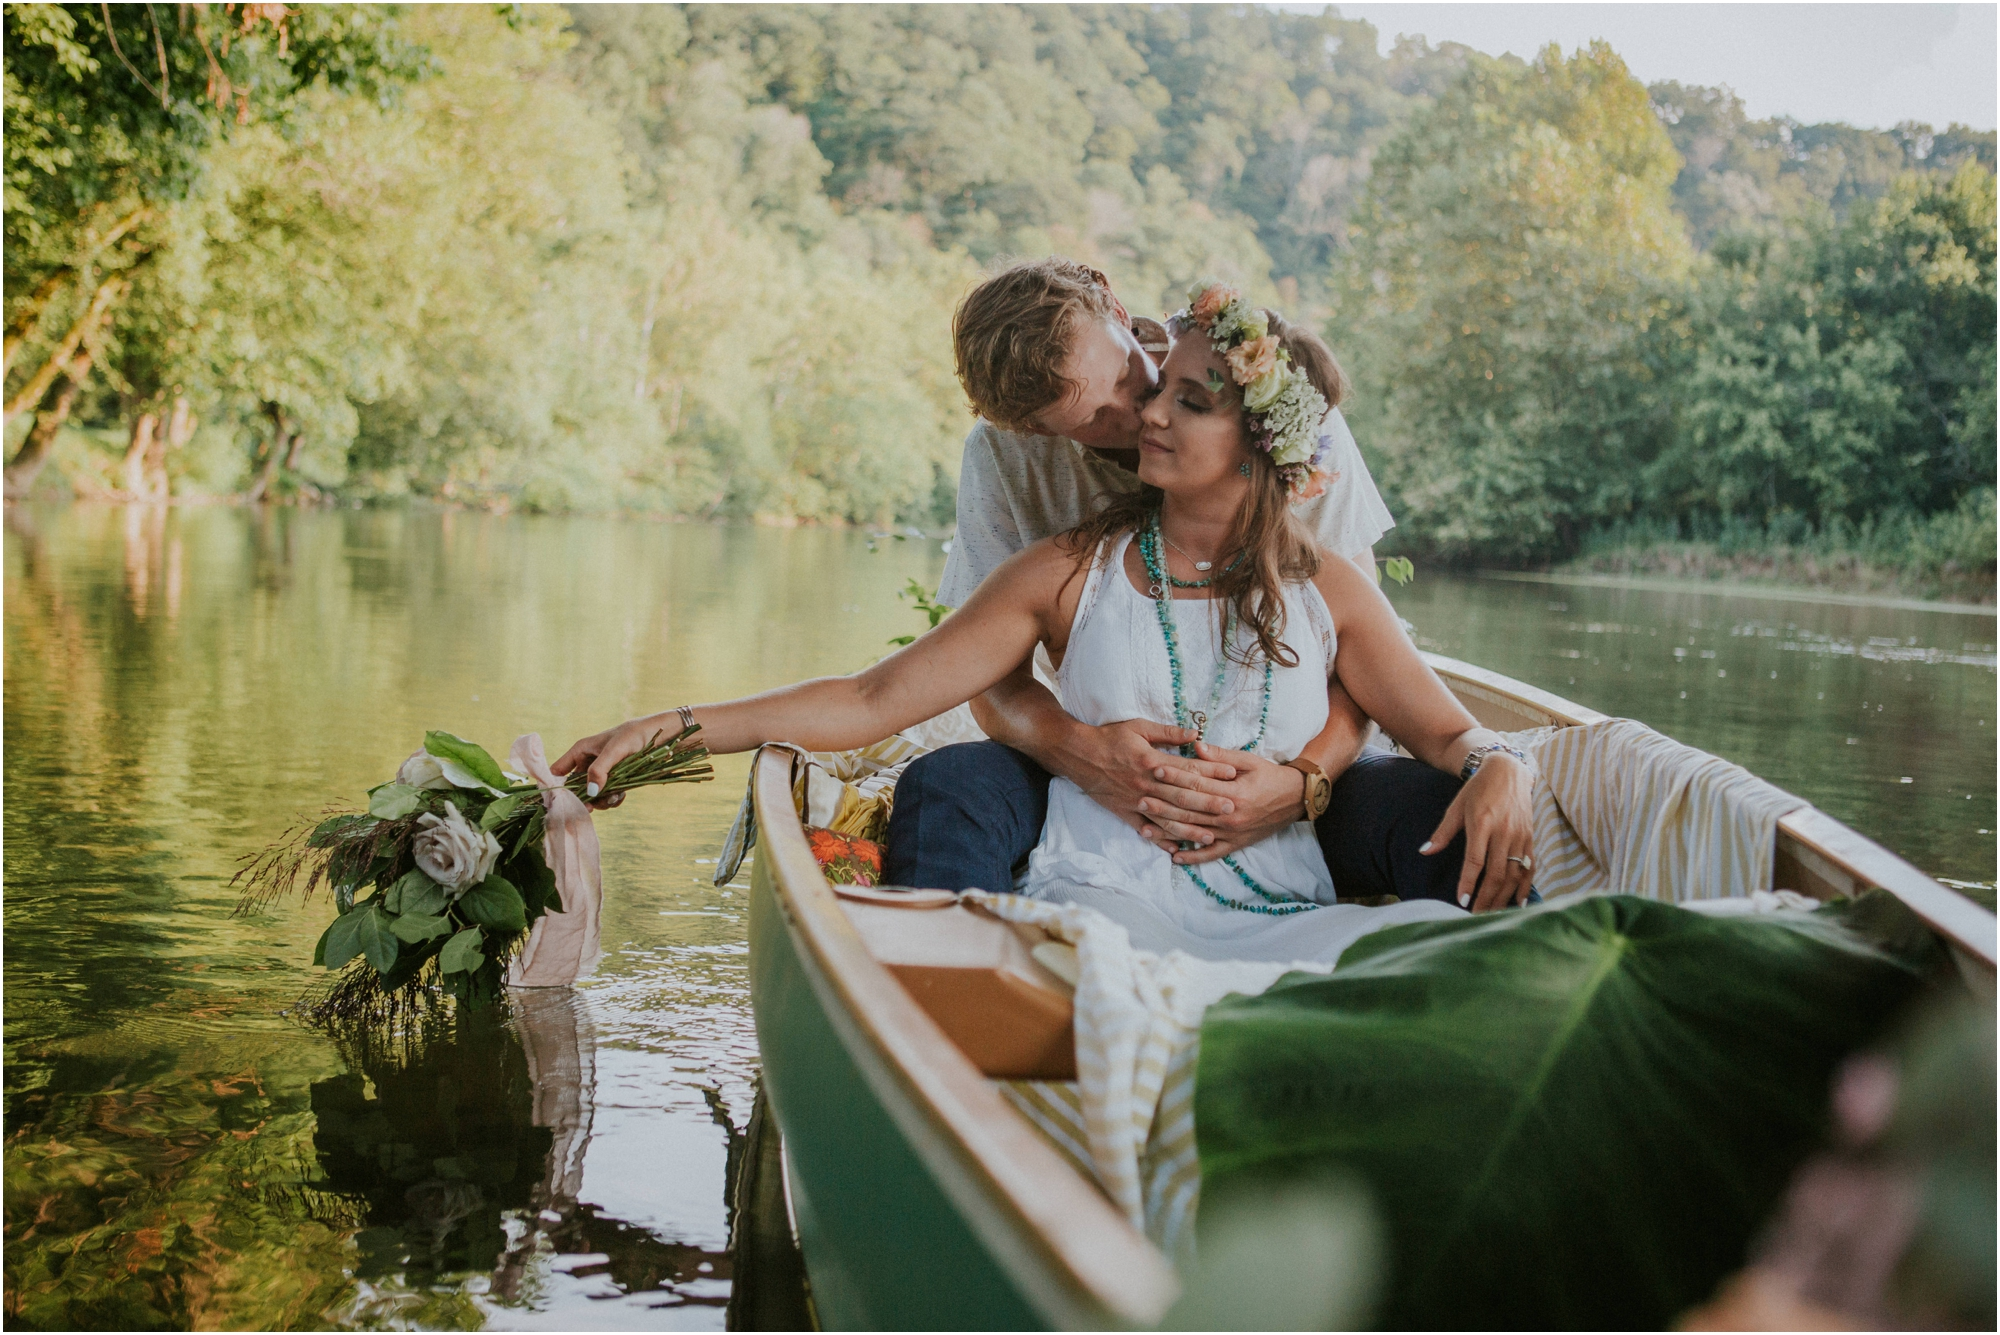 homestead-on-the-holston-hiltons-virginia-bohemian-canoe-styled-shoot-northeast-tennessee-elopement-wild-free-spirit_0021.jpg